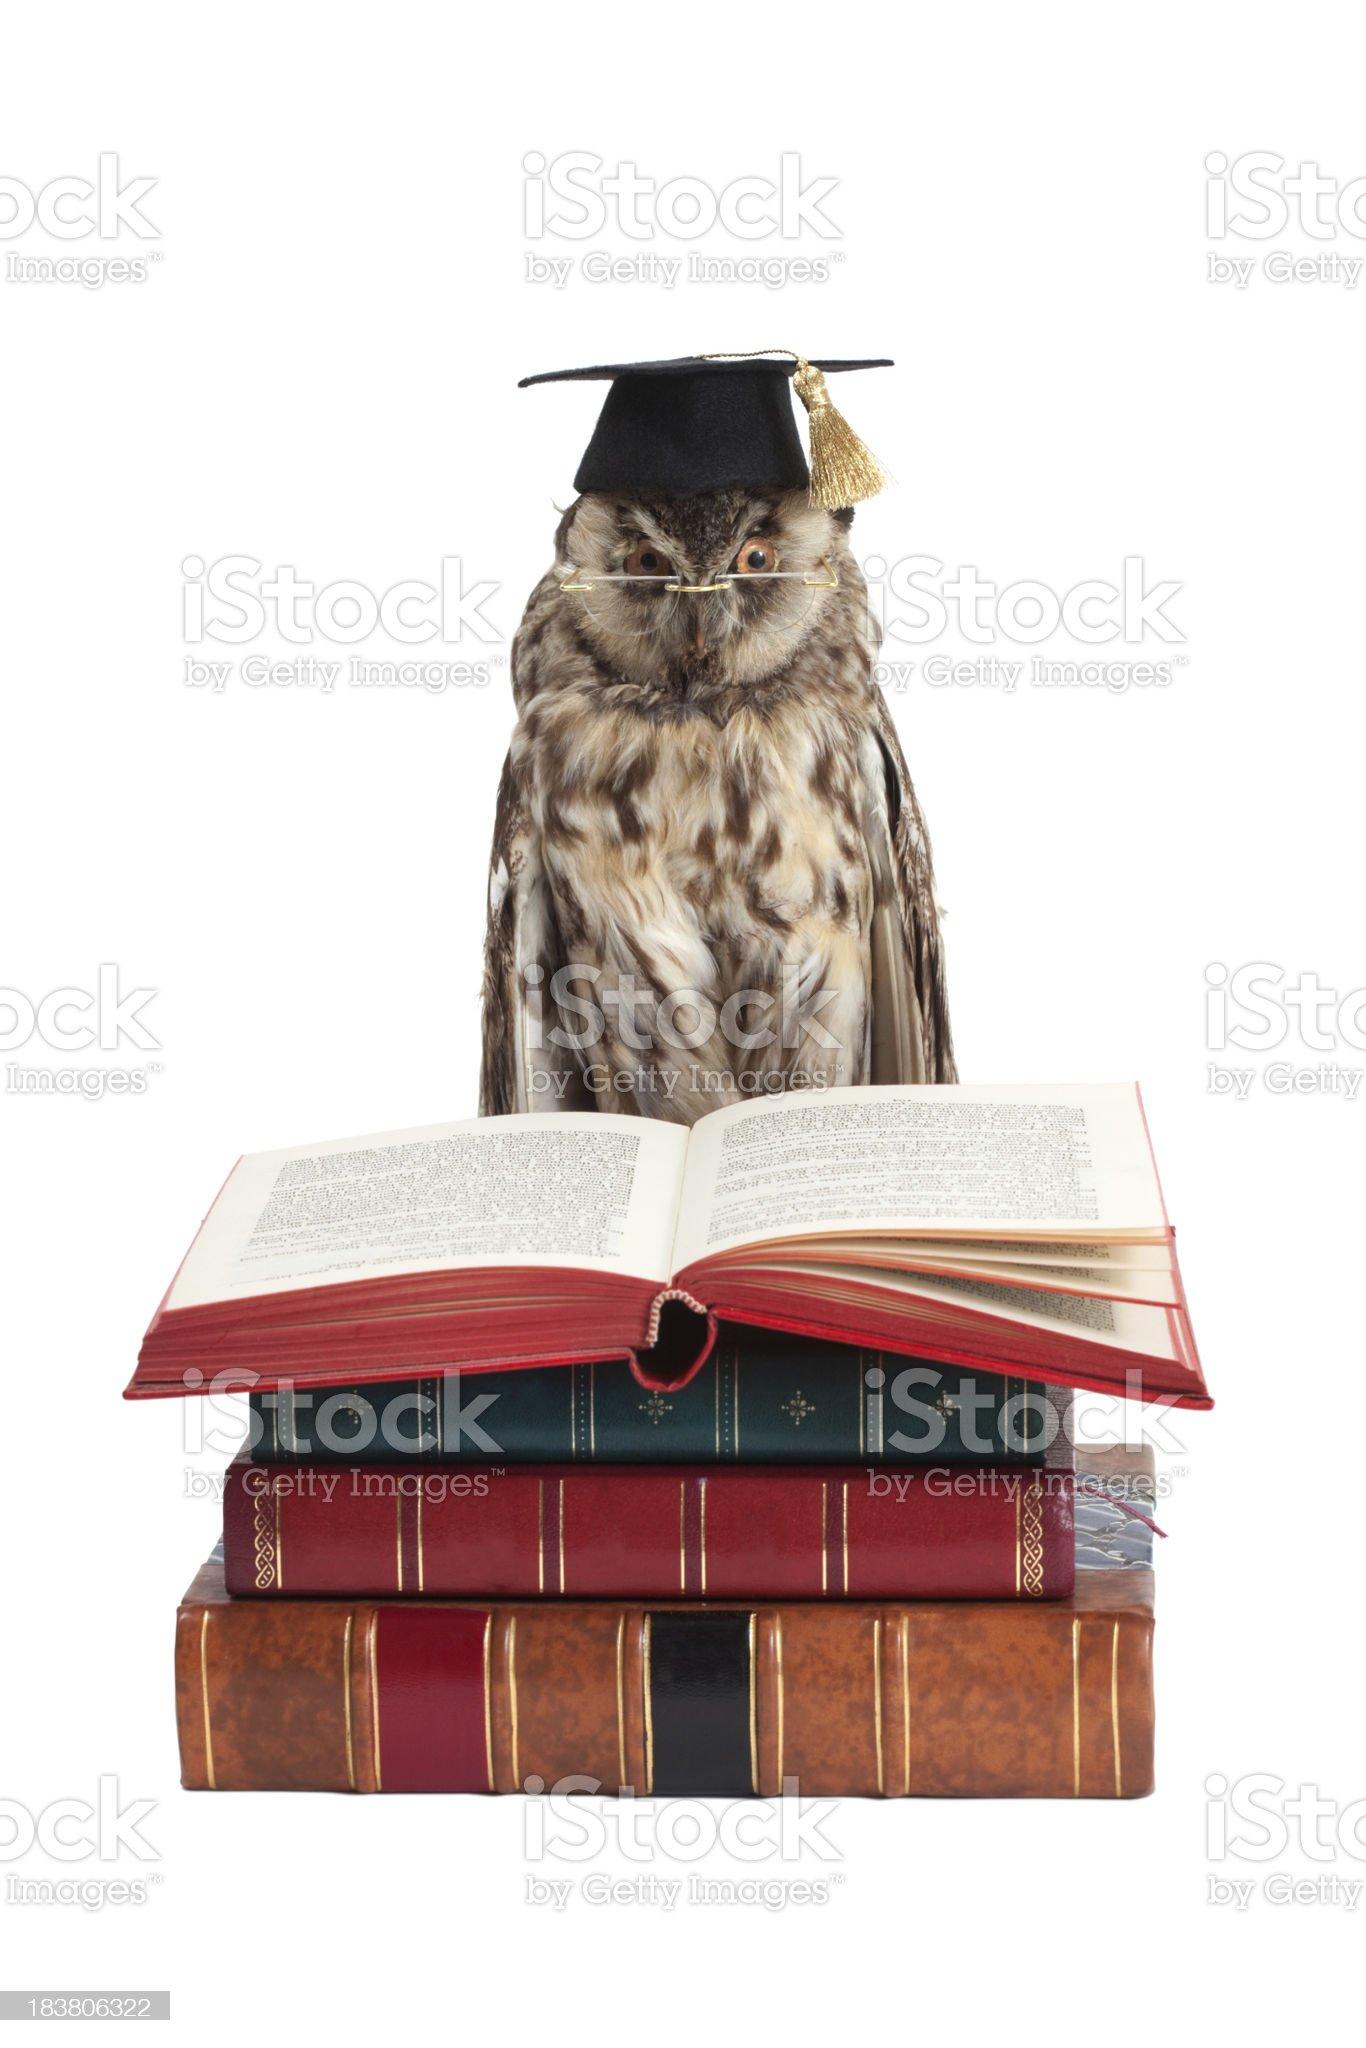 wise owl royalty-free stock photo